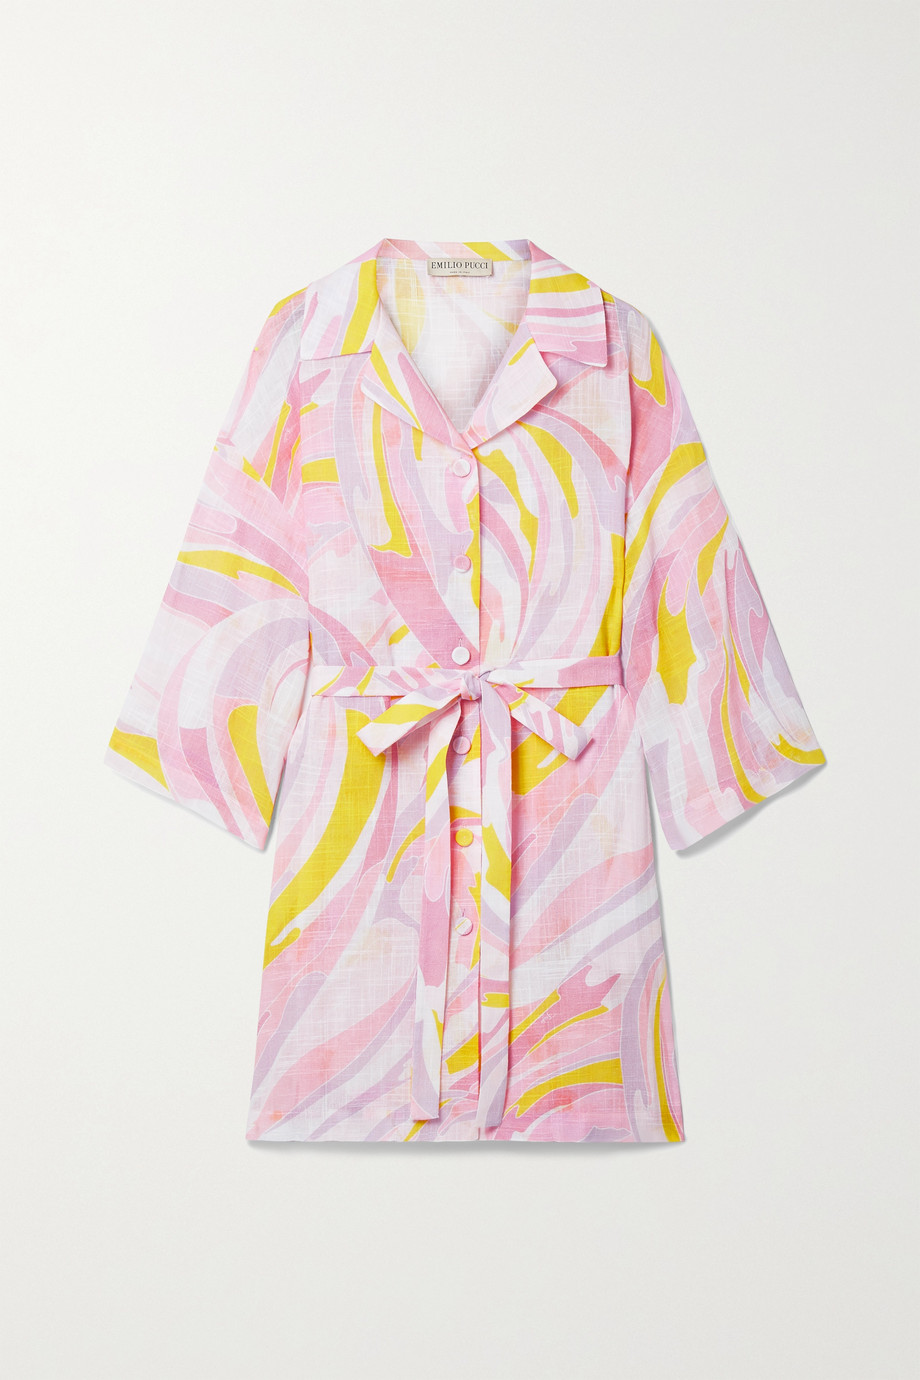 Emilio Pucci + NET SUSTAIN belted printed cotton-gauze mini shirt dress